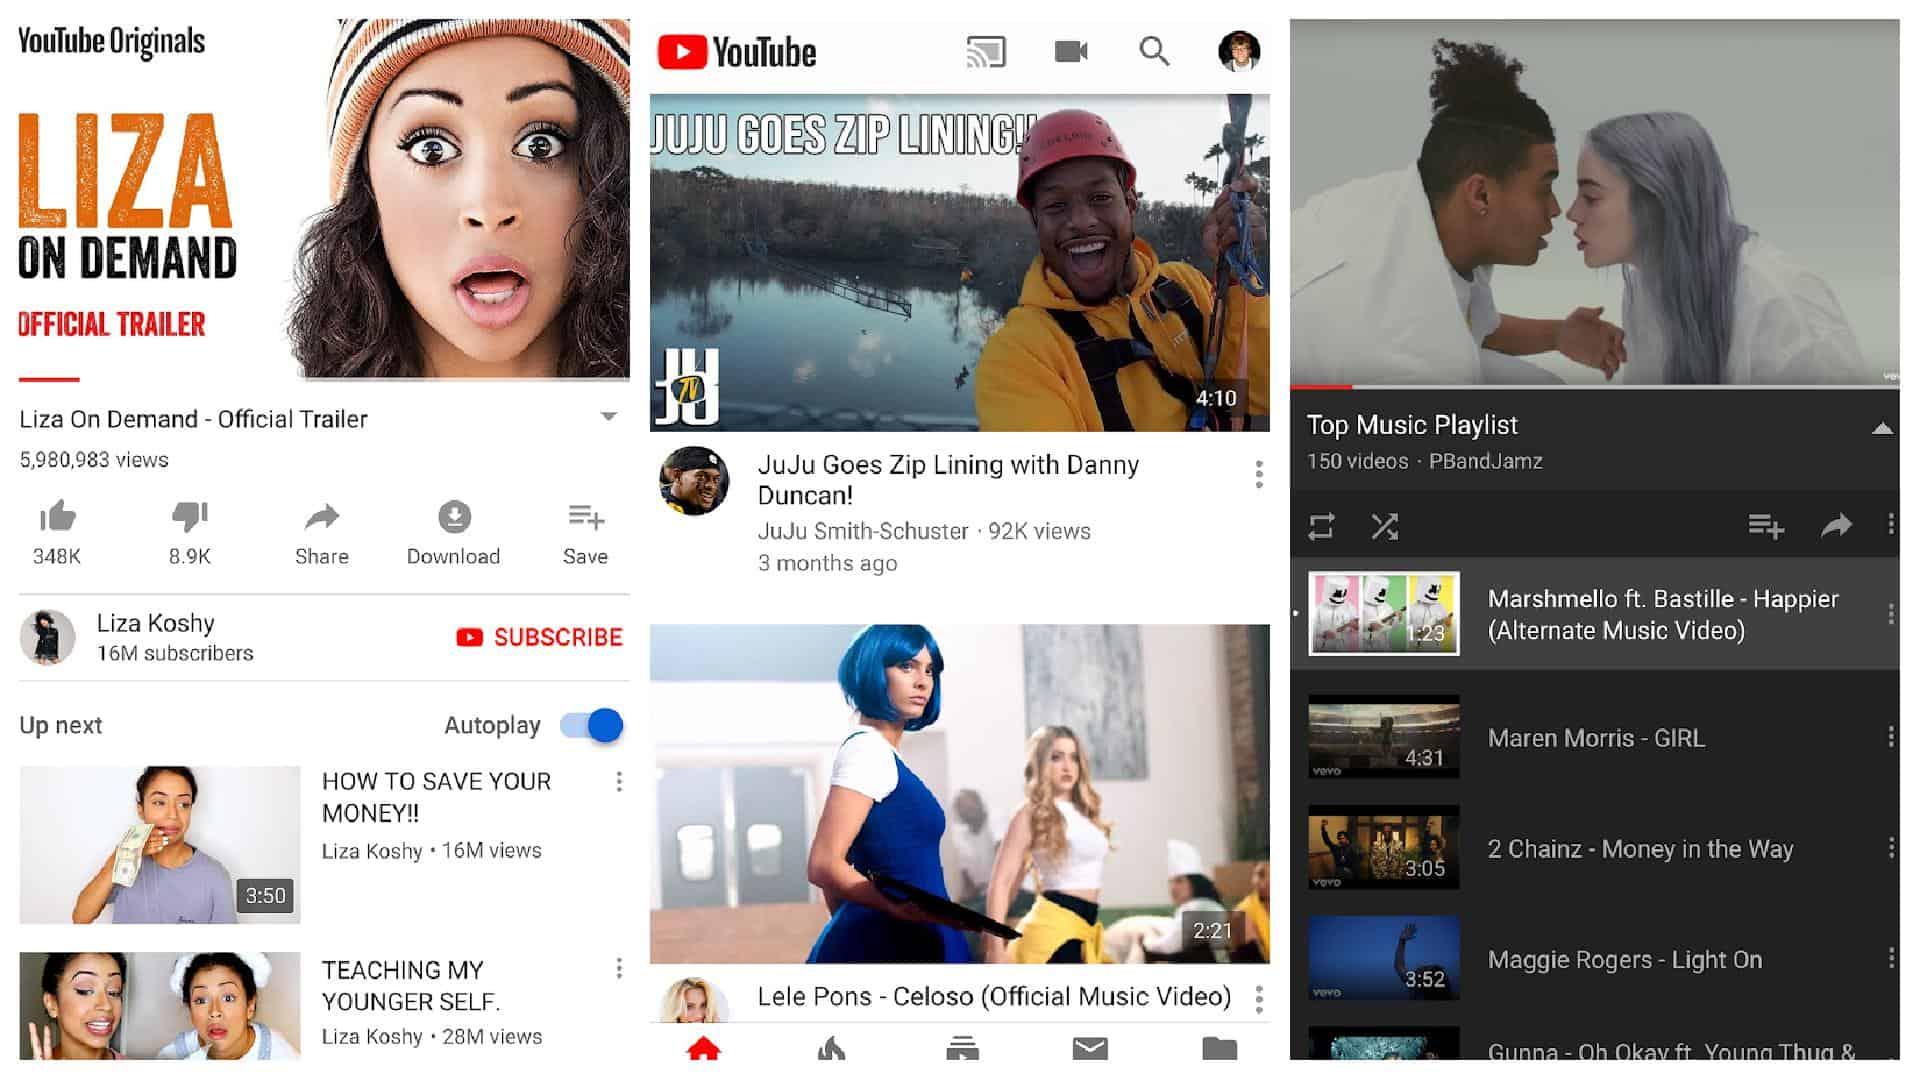 YouTube app grid 1